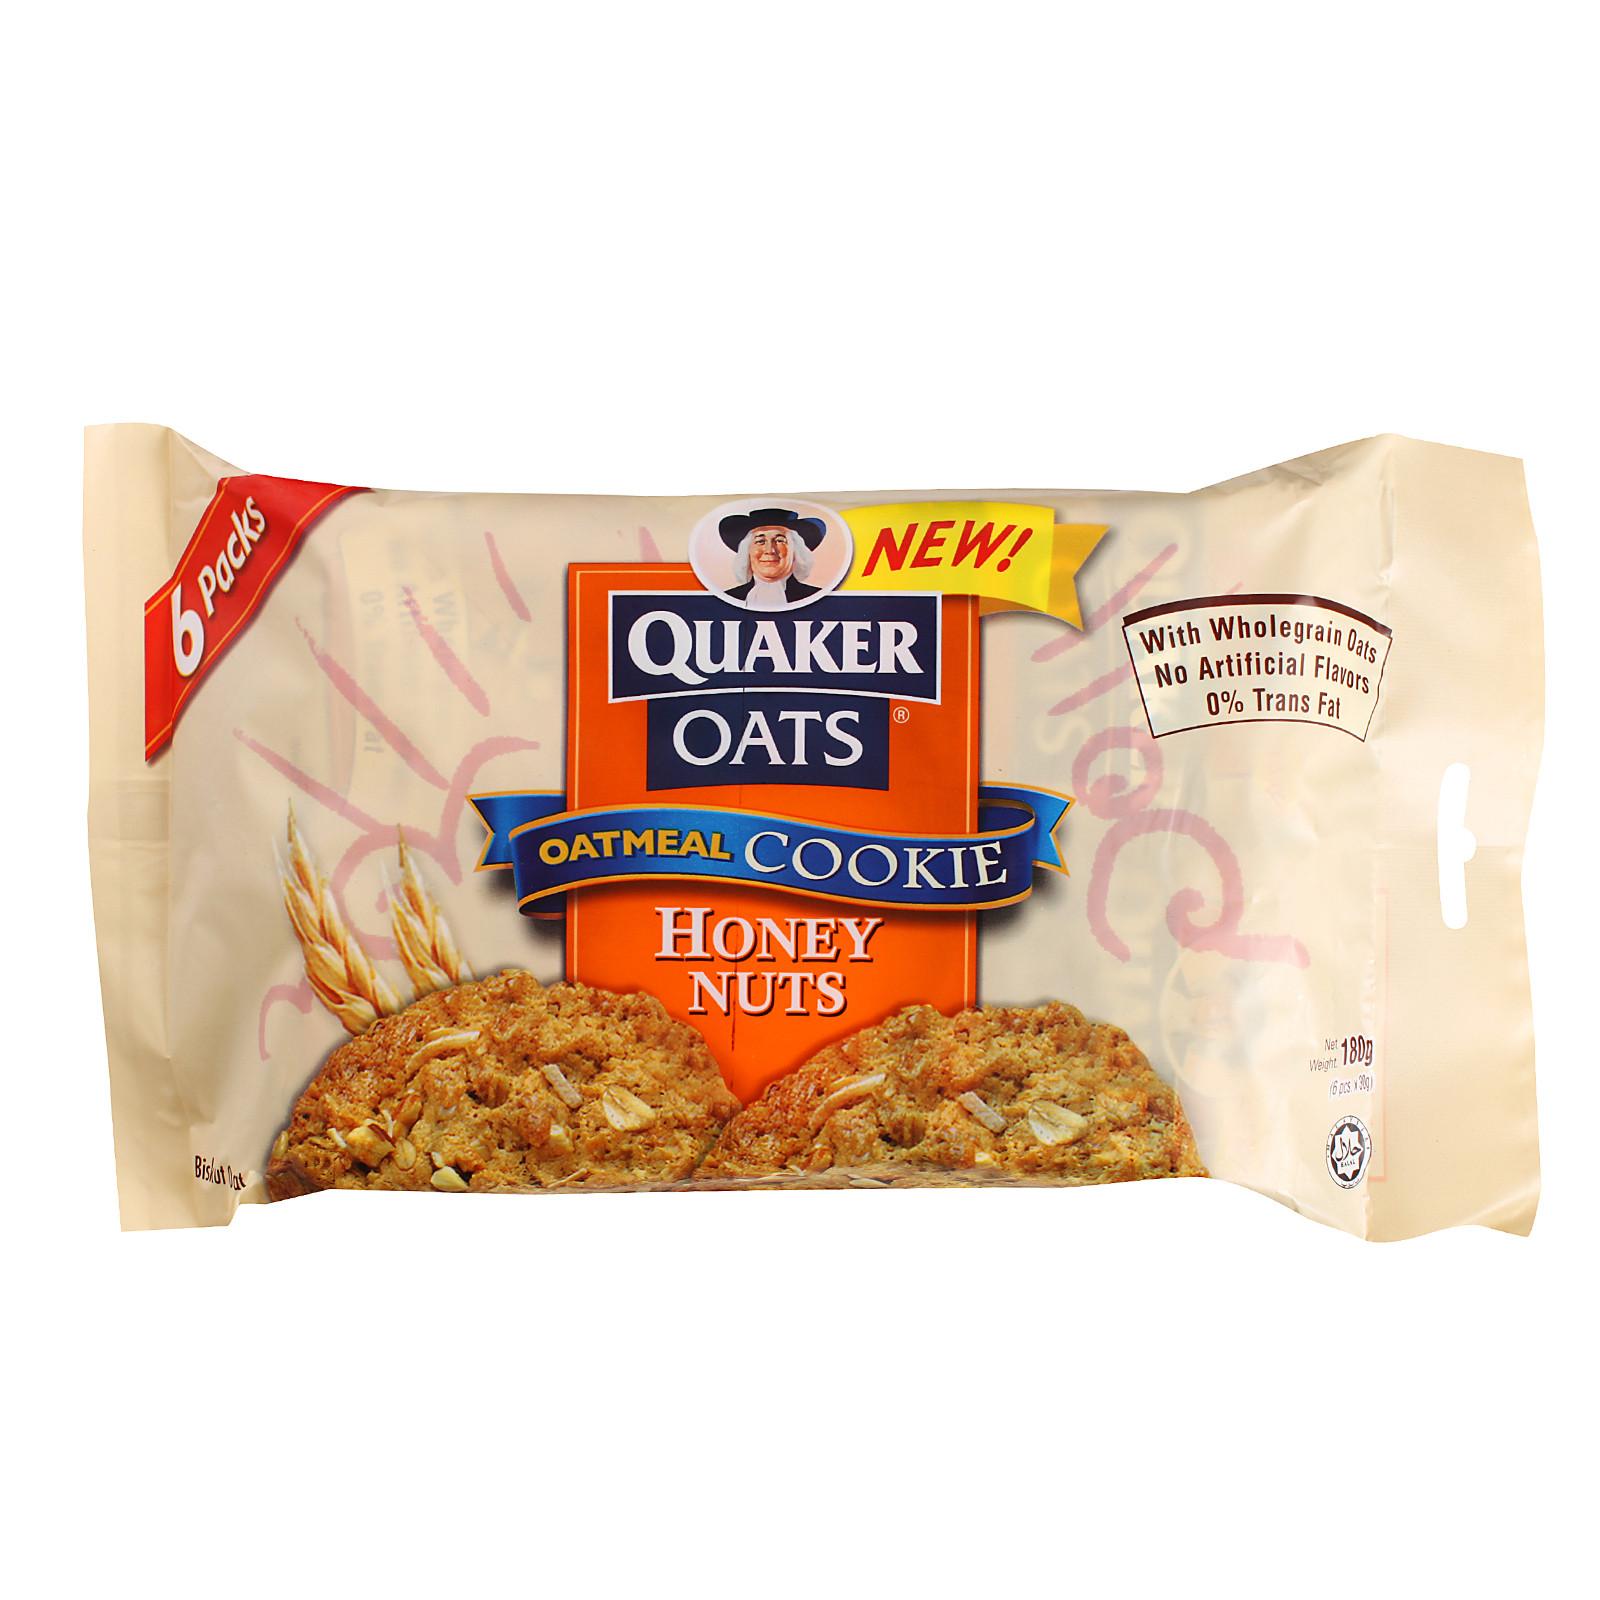 Quaker Oats Oatmeal Cookies  Quaker Oats Honey Nuts Oatmeal Cookies 162g from RedMart